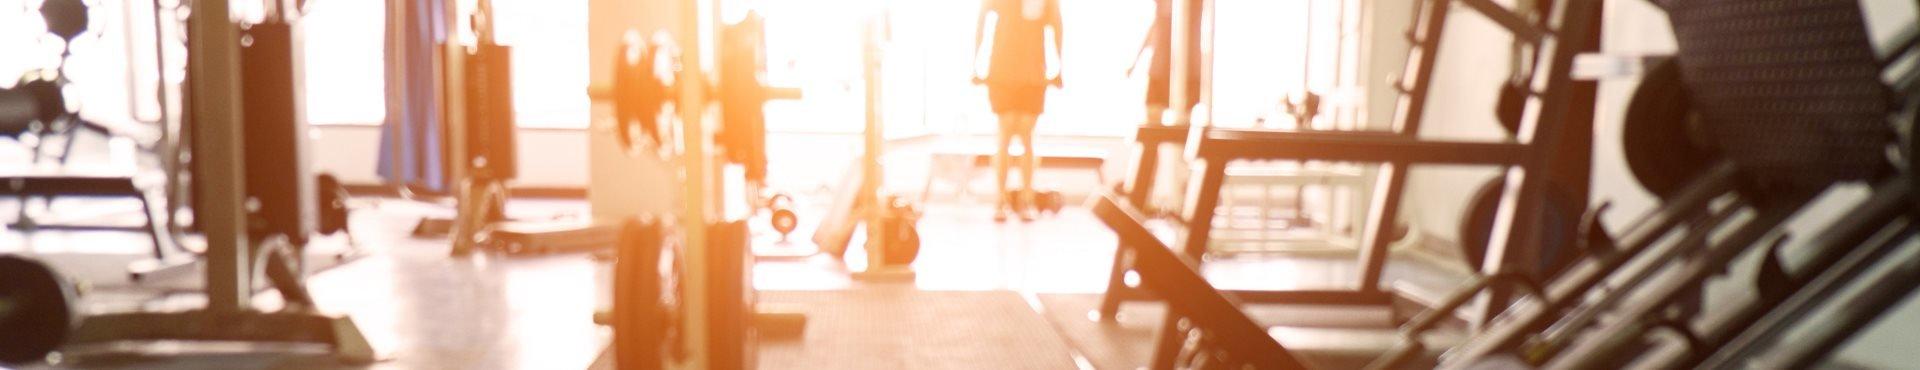 Inside a gym | Shine Lawyers